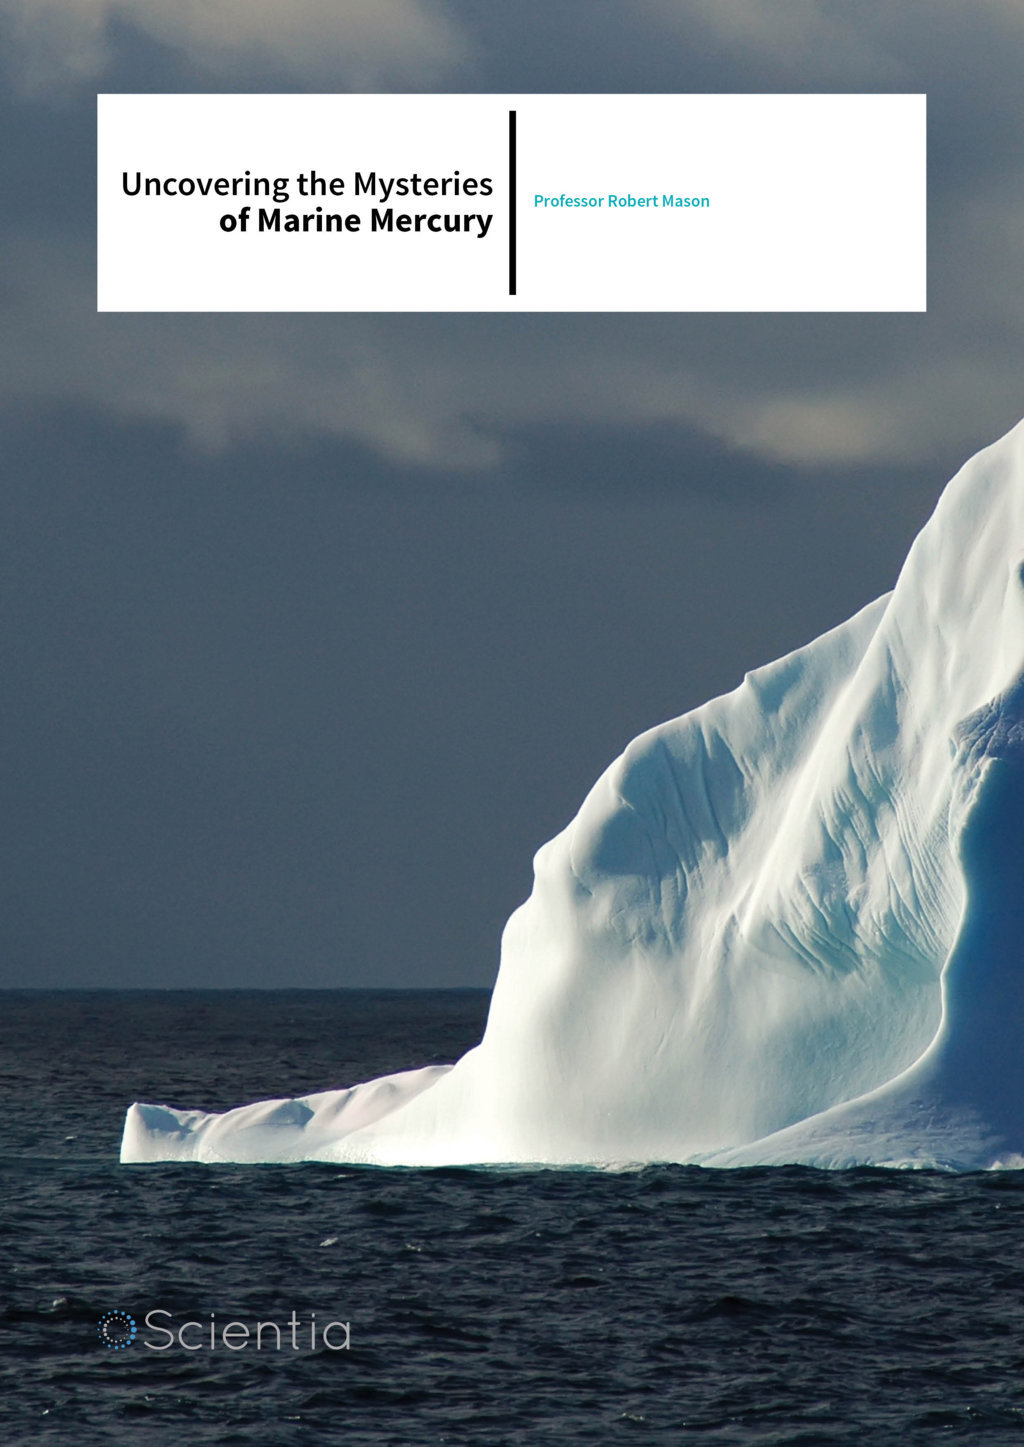 Professor Robert Mason – Uncovering The Mysteries Of Marine Mercury